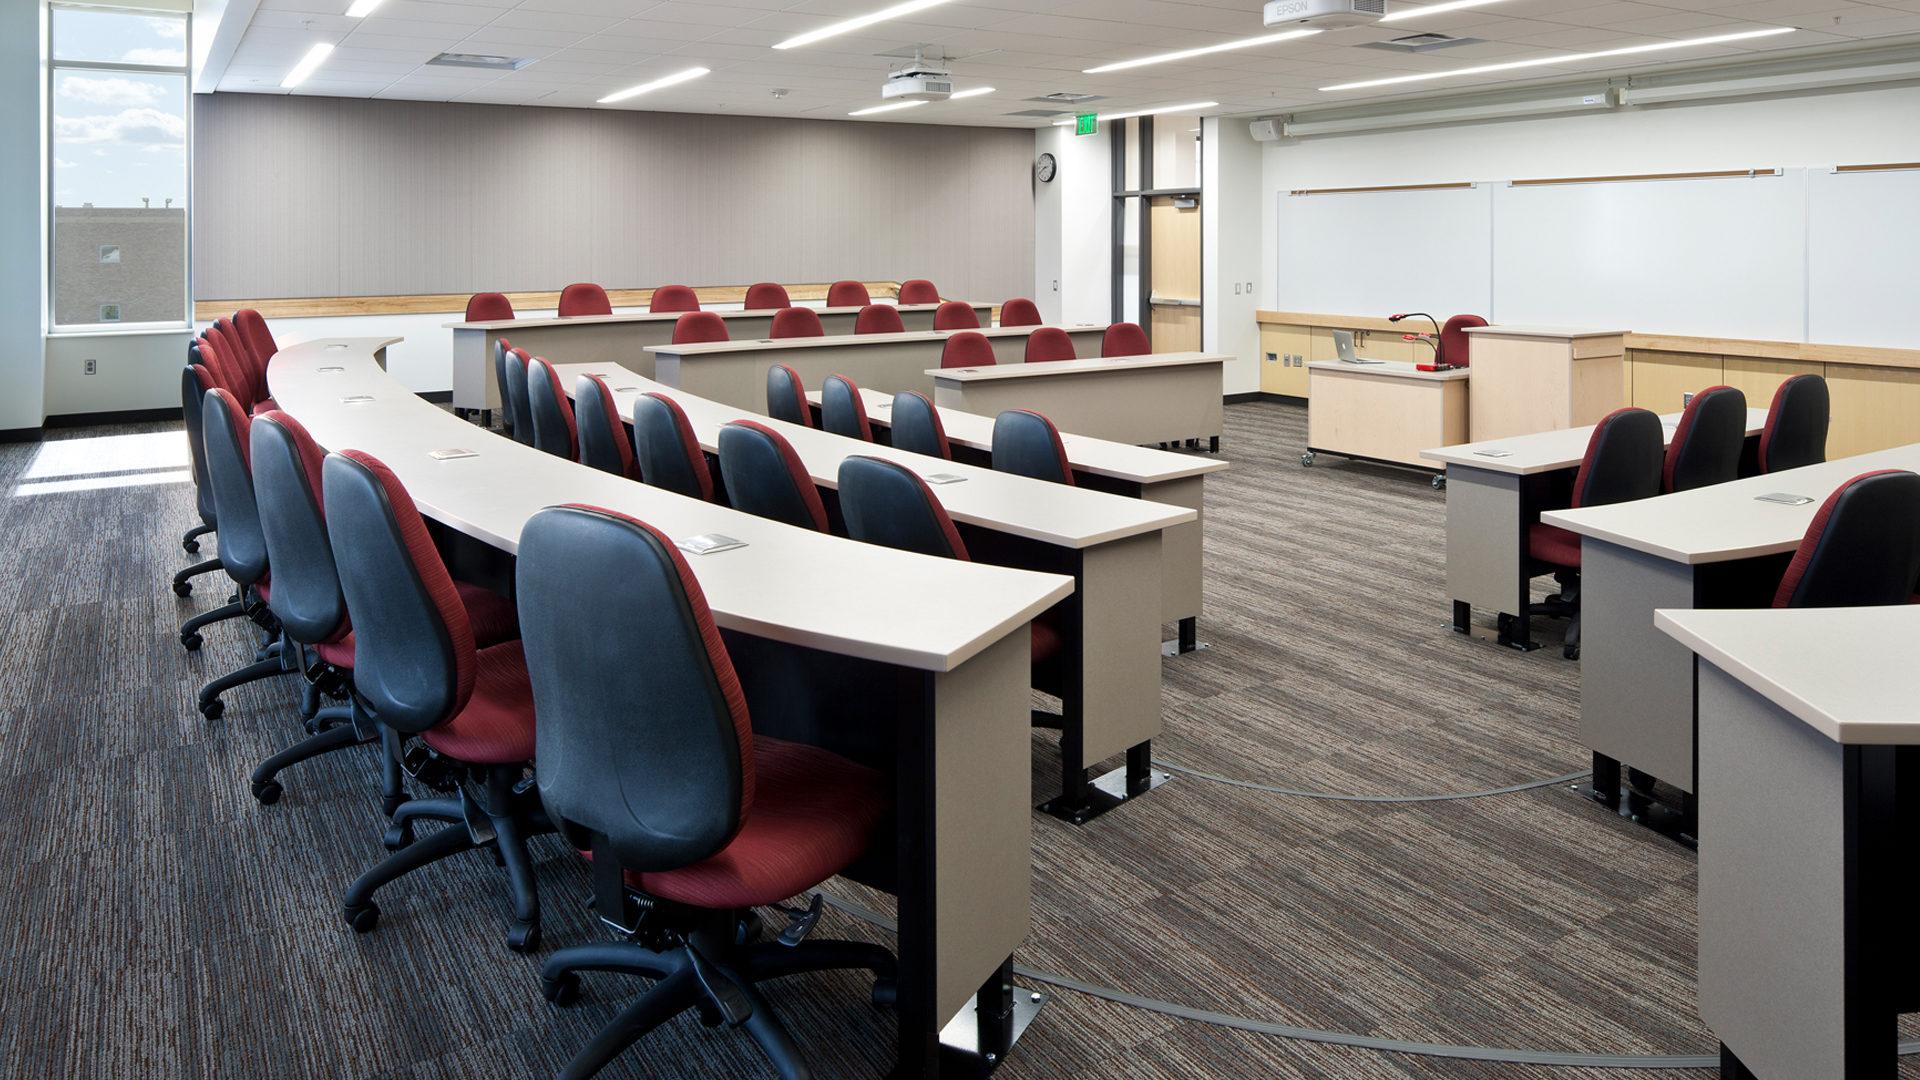 Gustavus Adolphus College Beck Academic Hall Interior Class Room